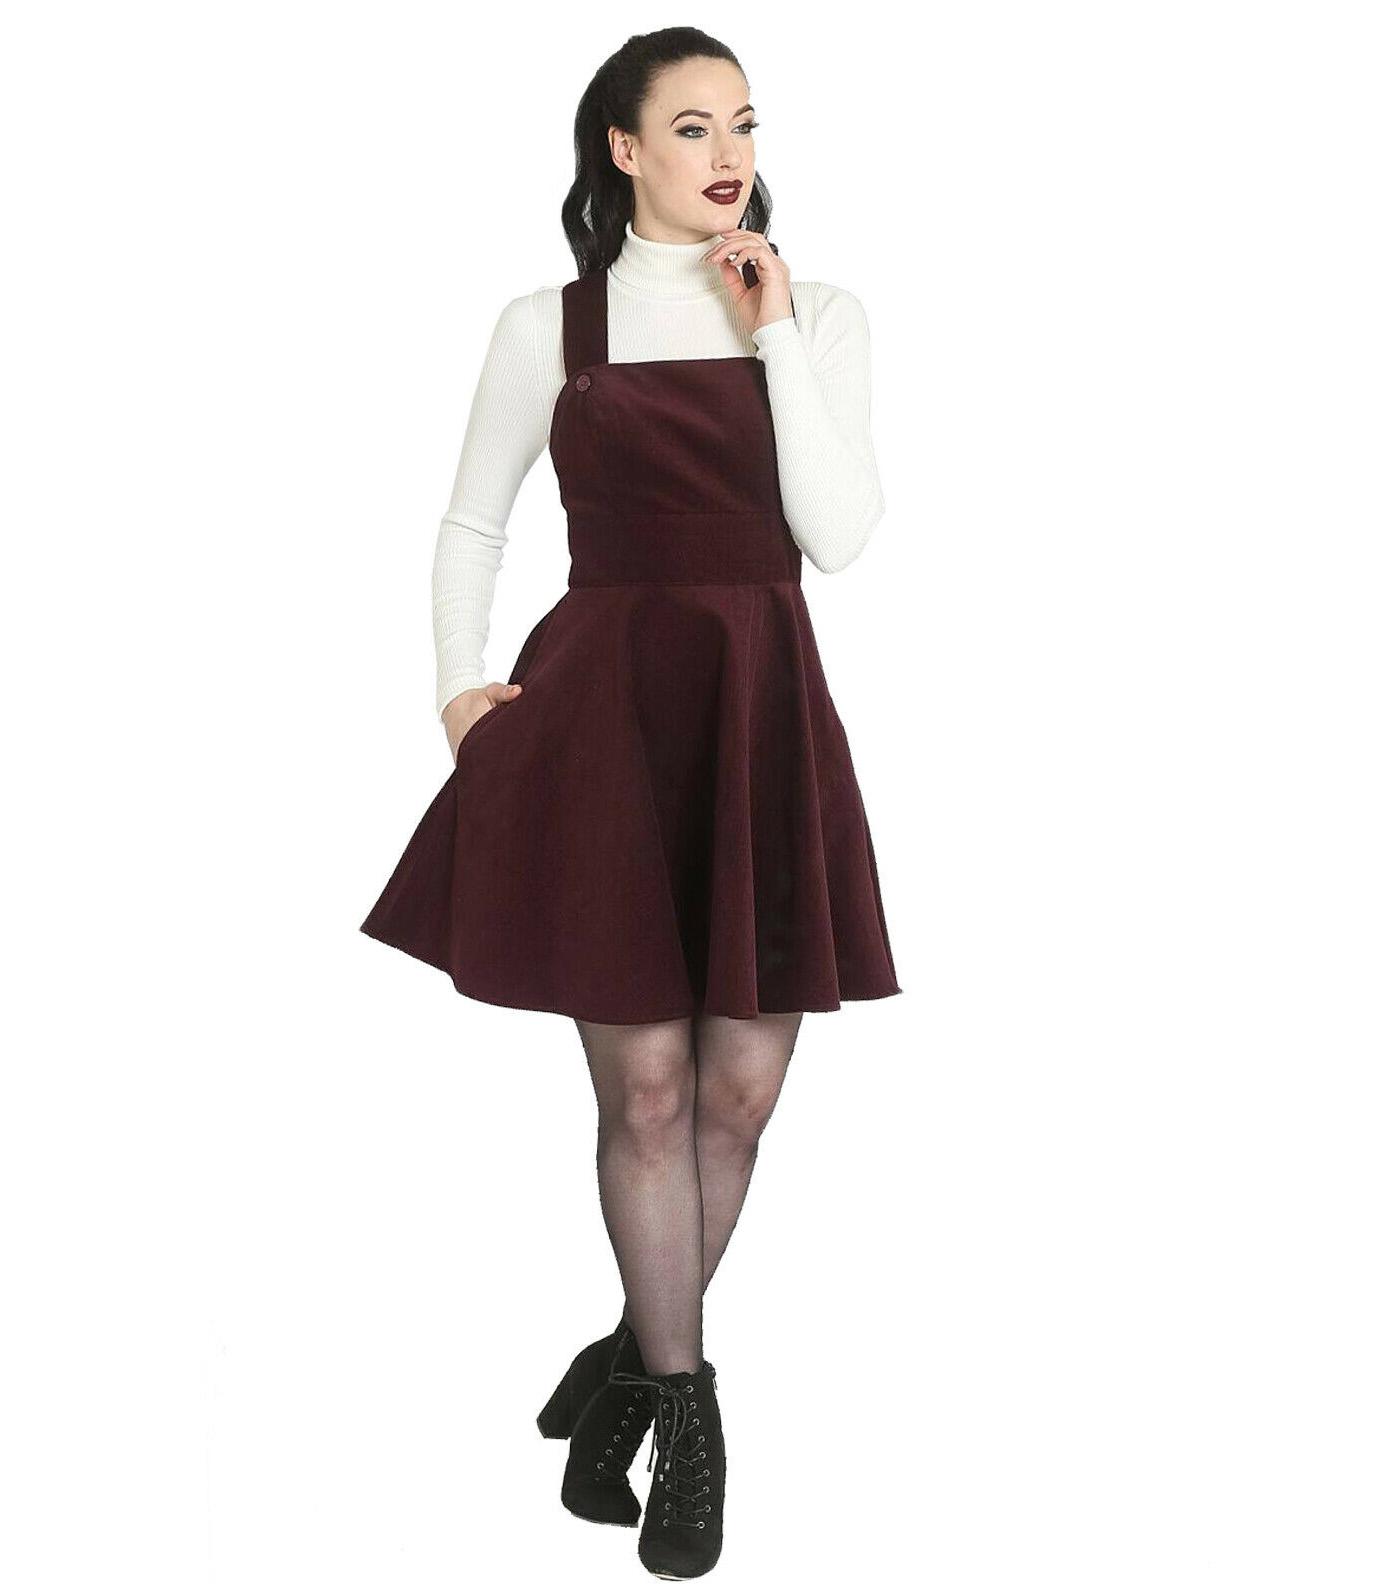 Hell-Bunny-Rockabilly-Corduroy-Mini-Dress-WONDER-YEARS-Pinafore-Wine-All-Sizes thumbnail 11